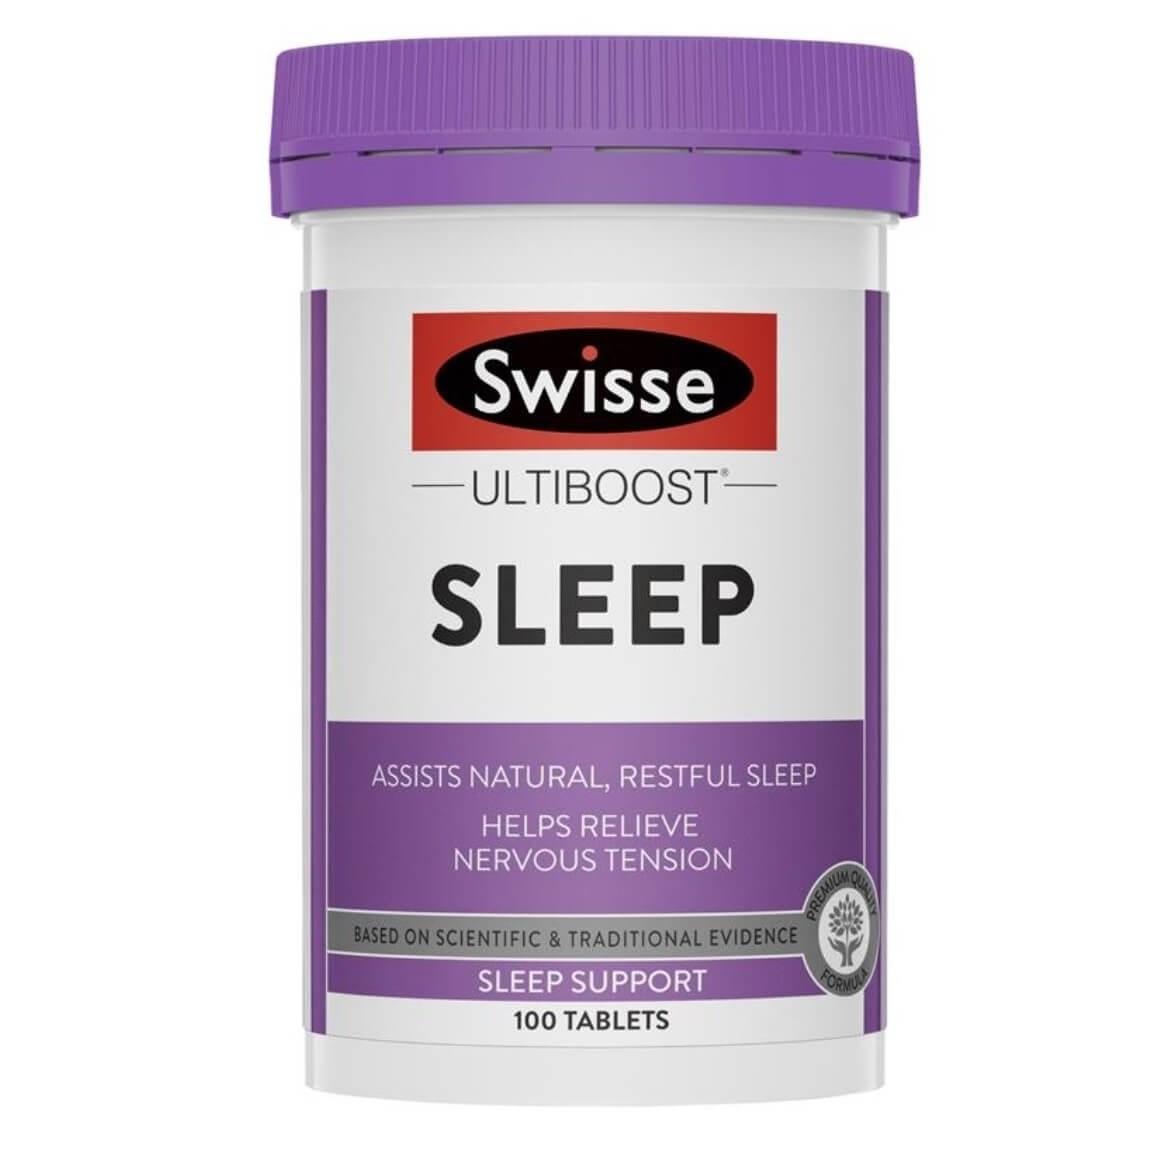 Swisse-Sleep 100 Tablets Licorice Extract Wishlist Swisse-Sleep 100 Tablets